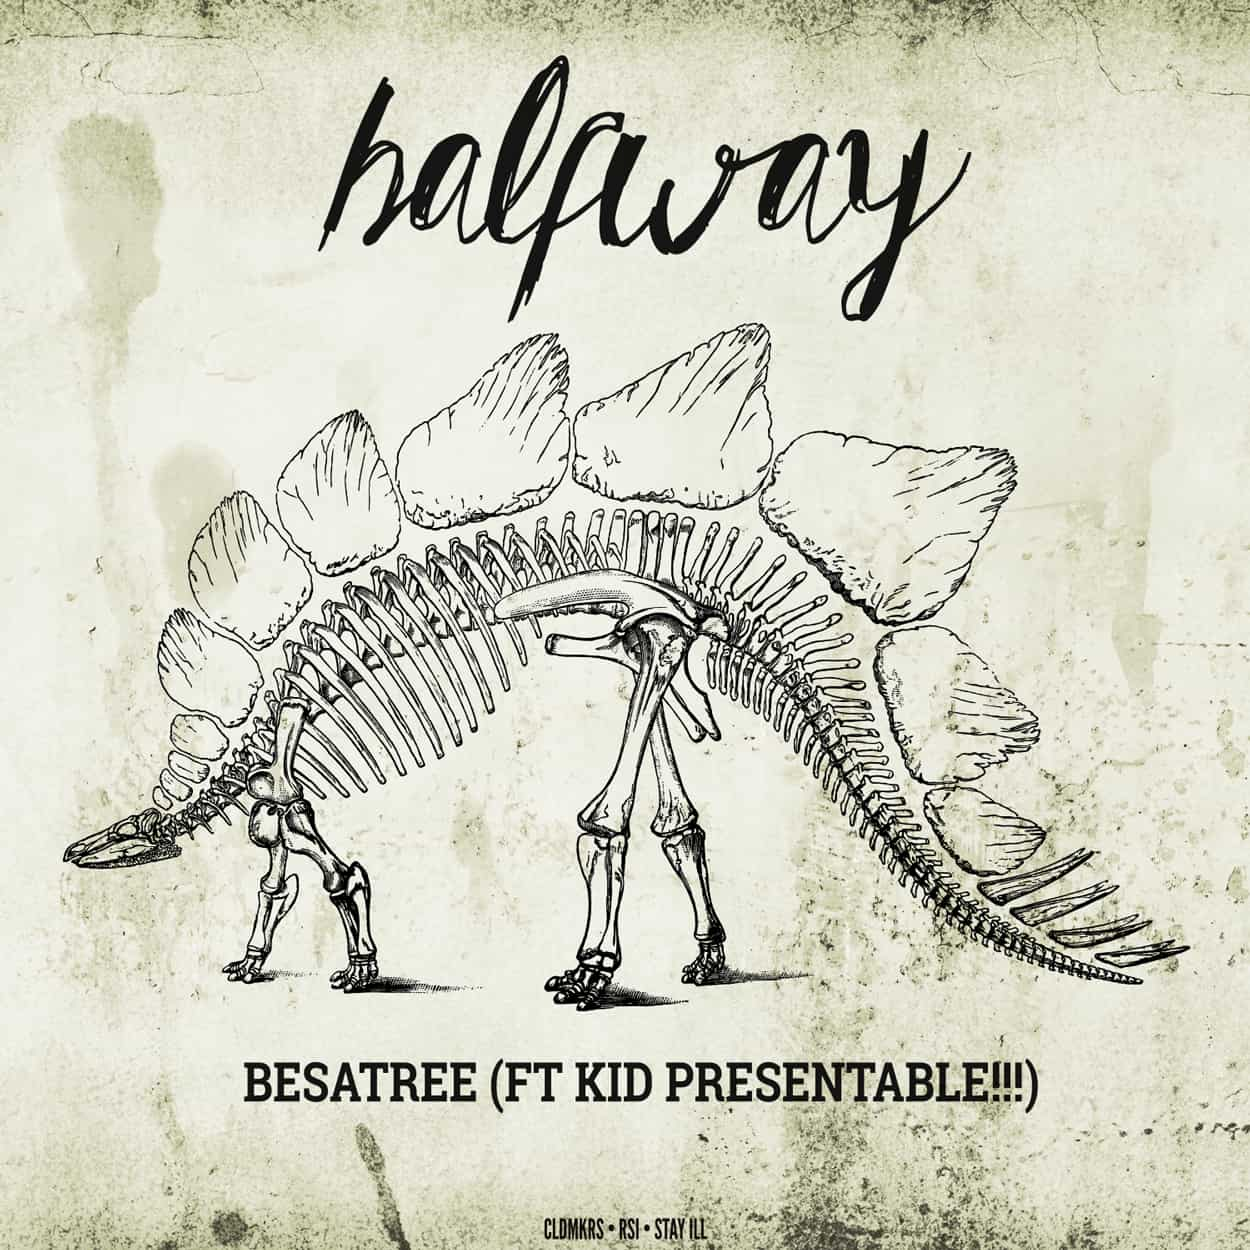 halfway - album art design